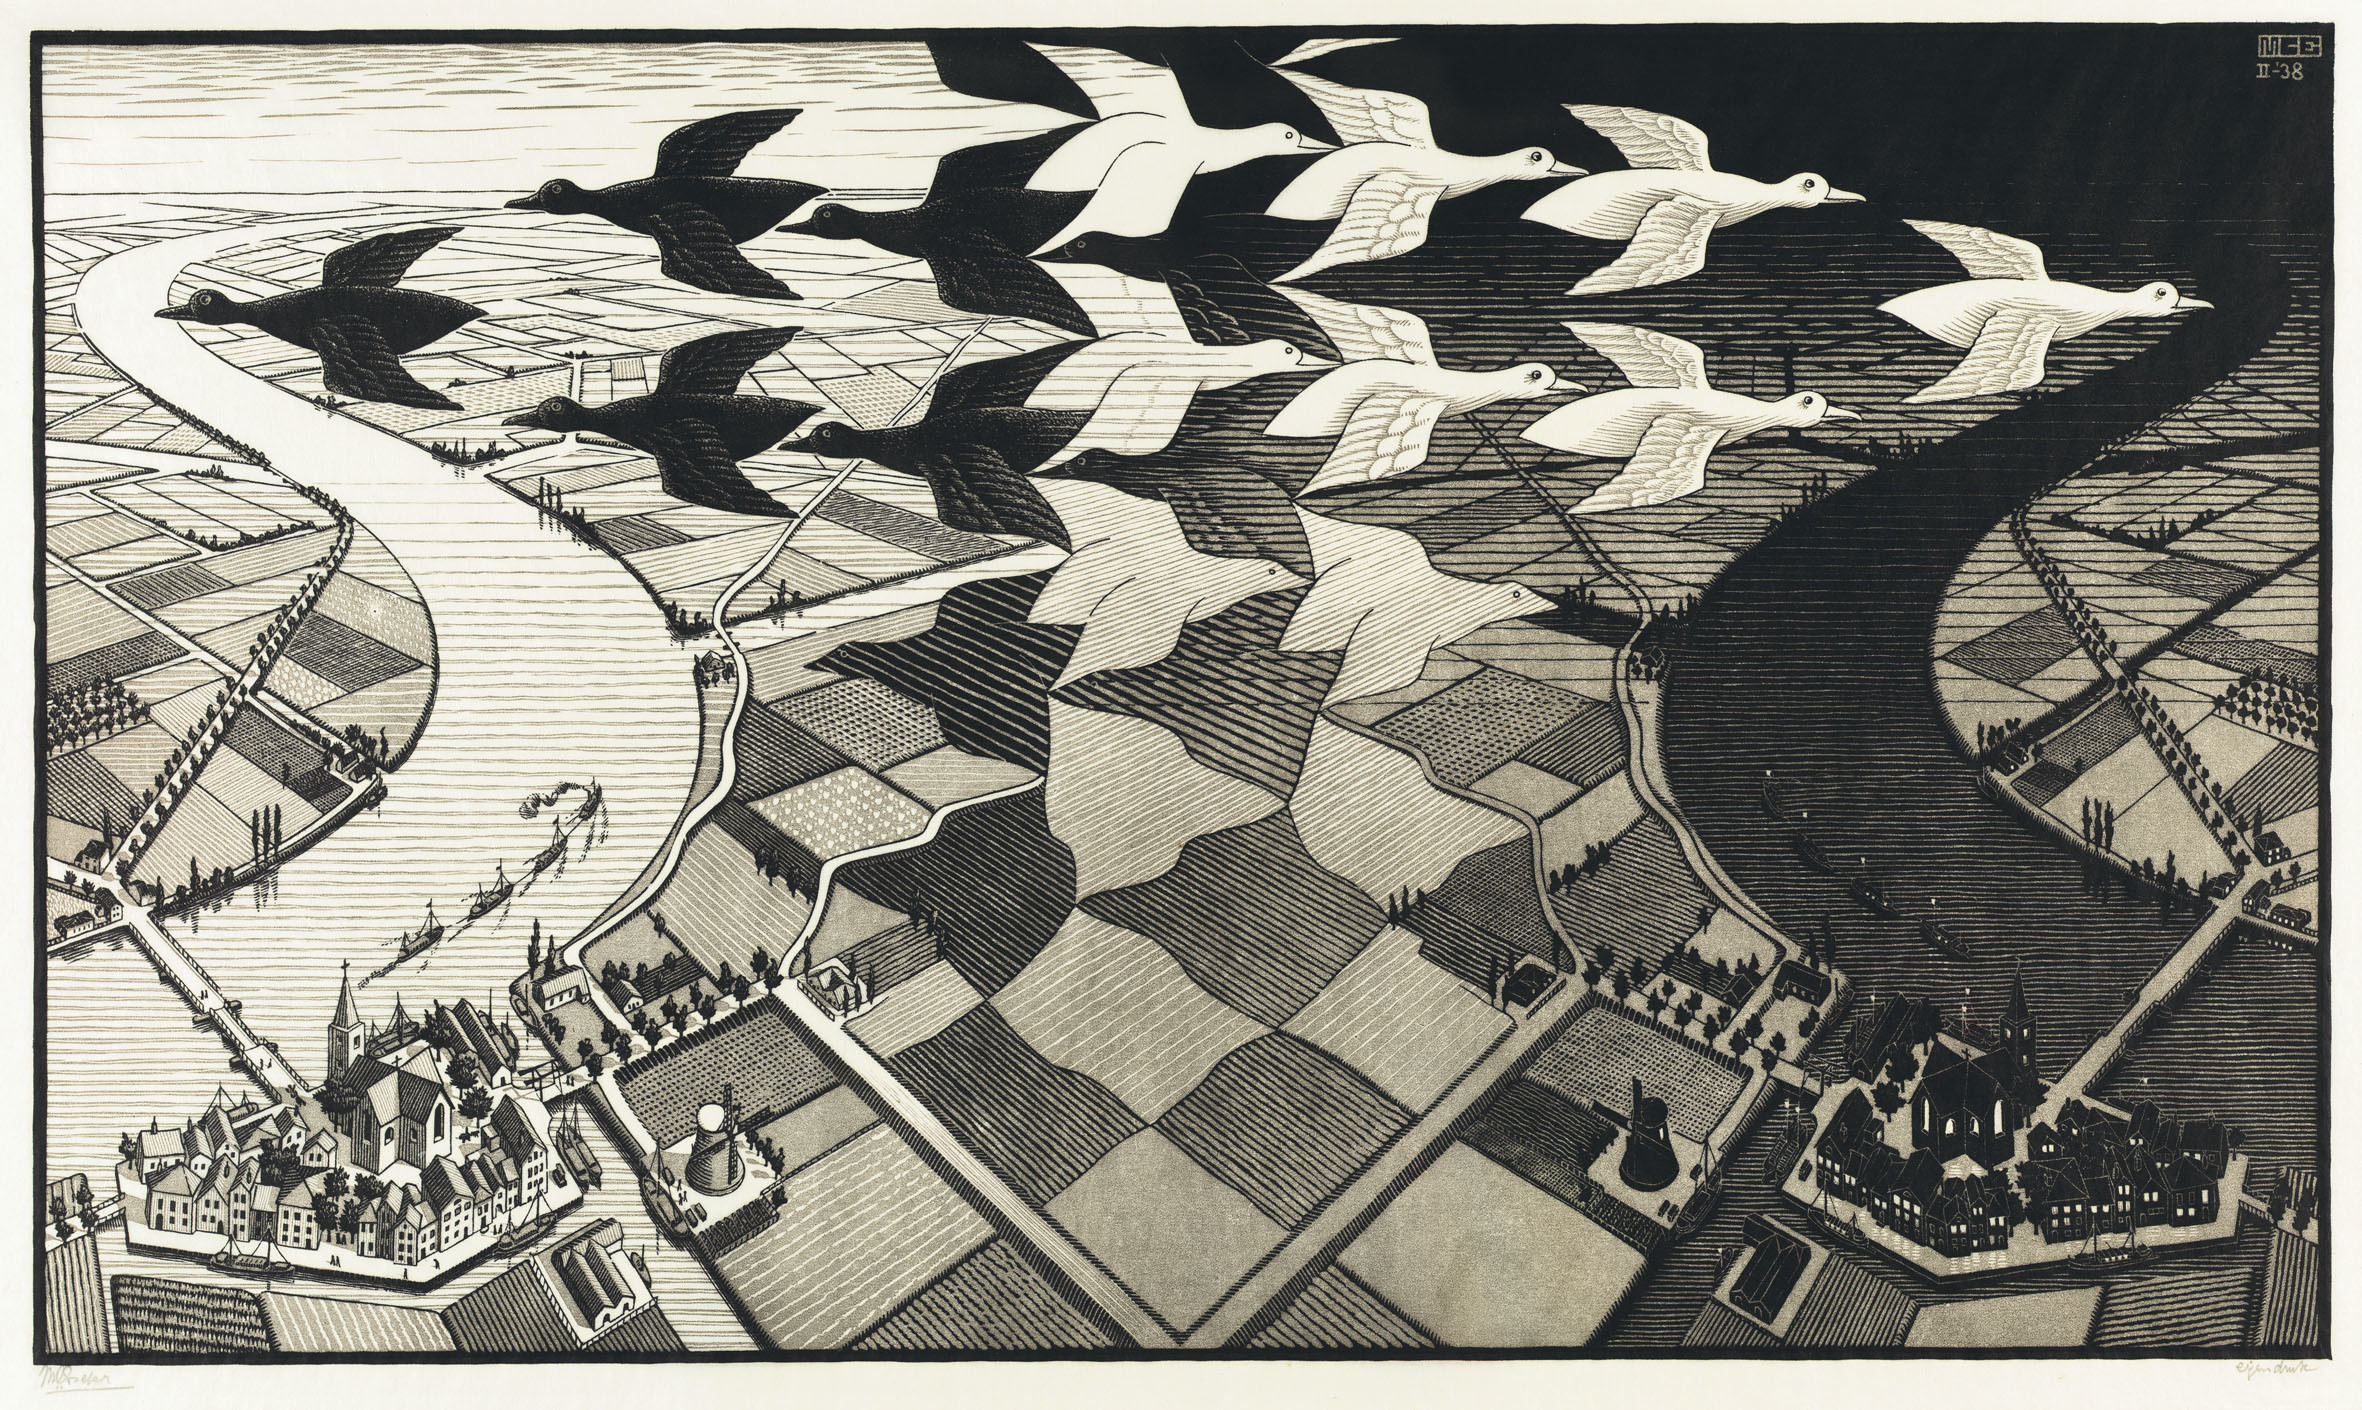 (MC Escher: 'Day and Night', 1938. © The M.C. Escher Company BV -Baarn-the Netherlands )